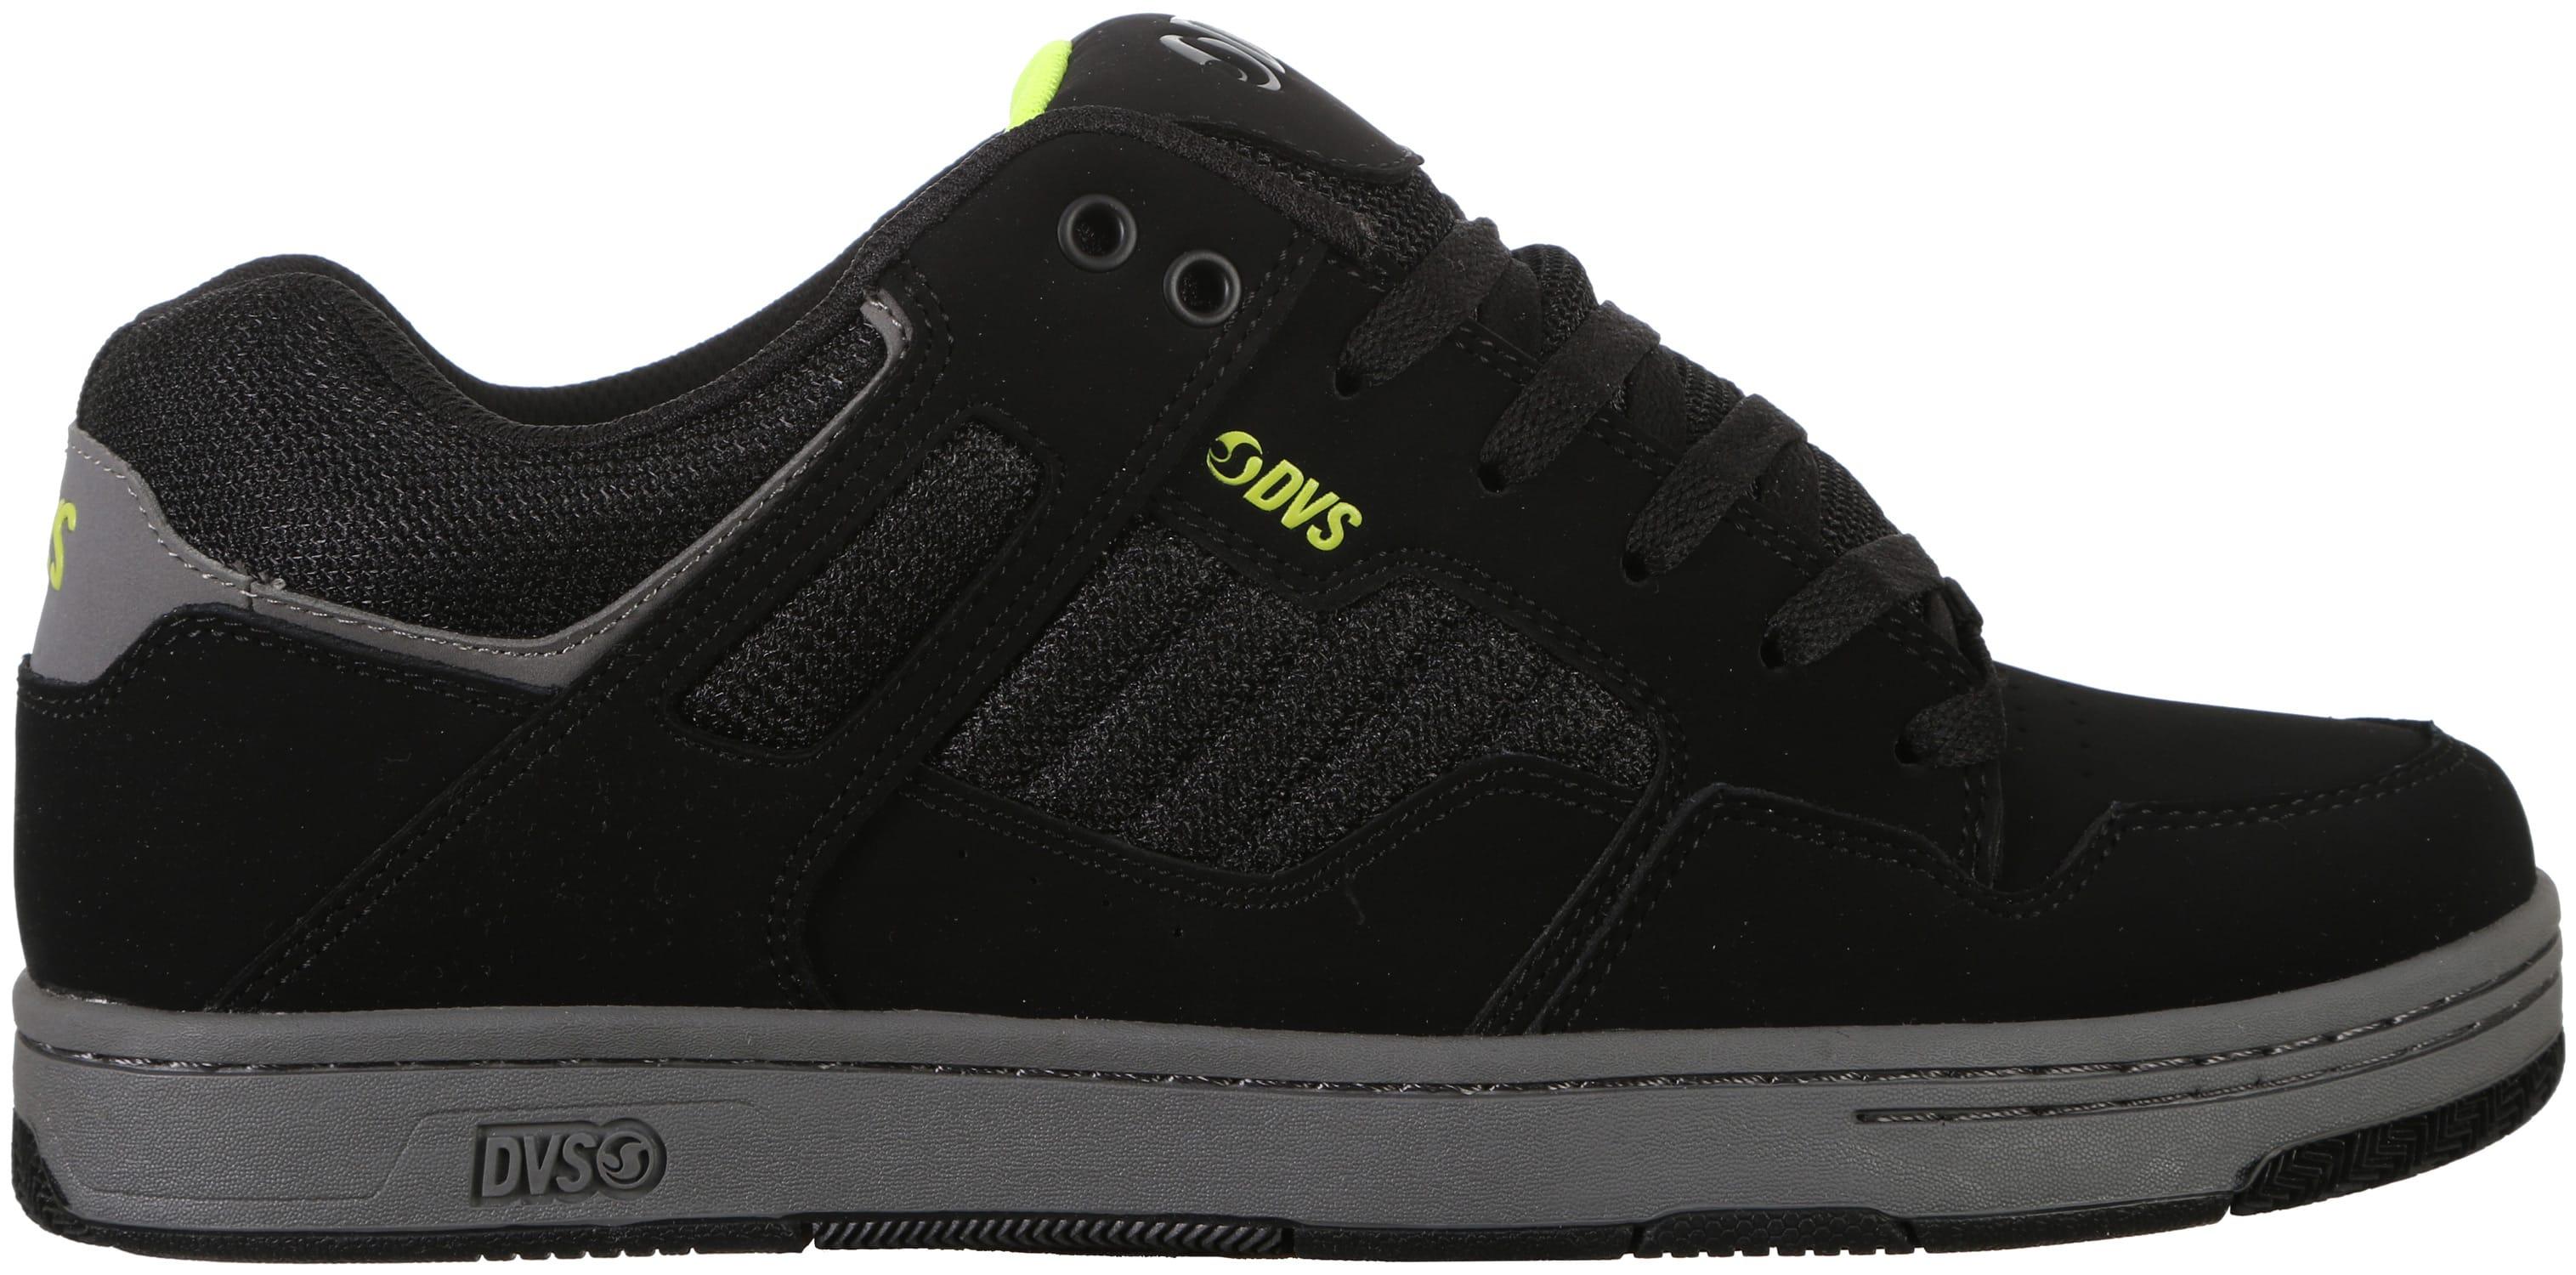 b38913cad5627 DVS Enduro 125 Skate Shoes - thumbnail 1